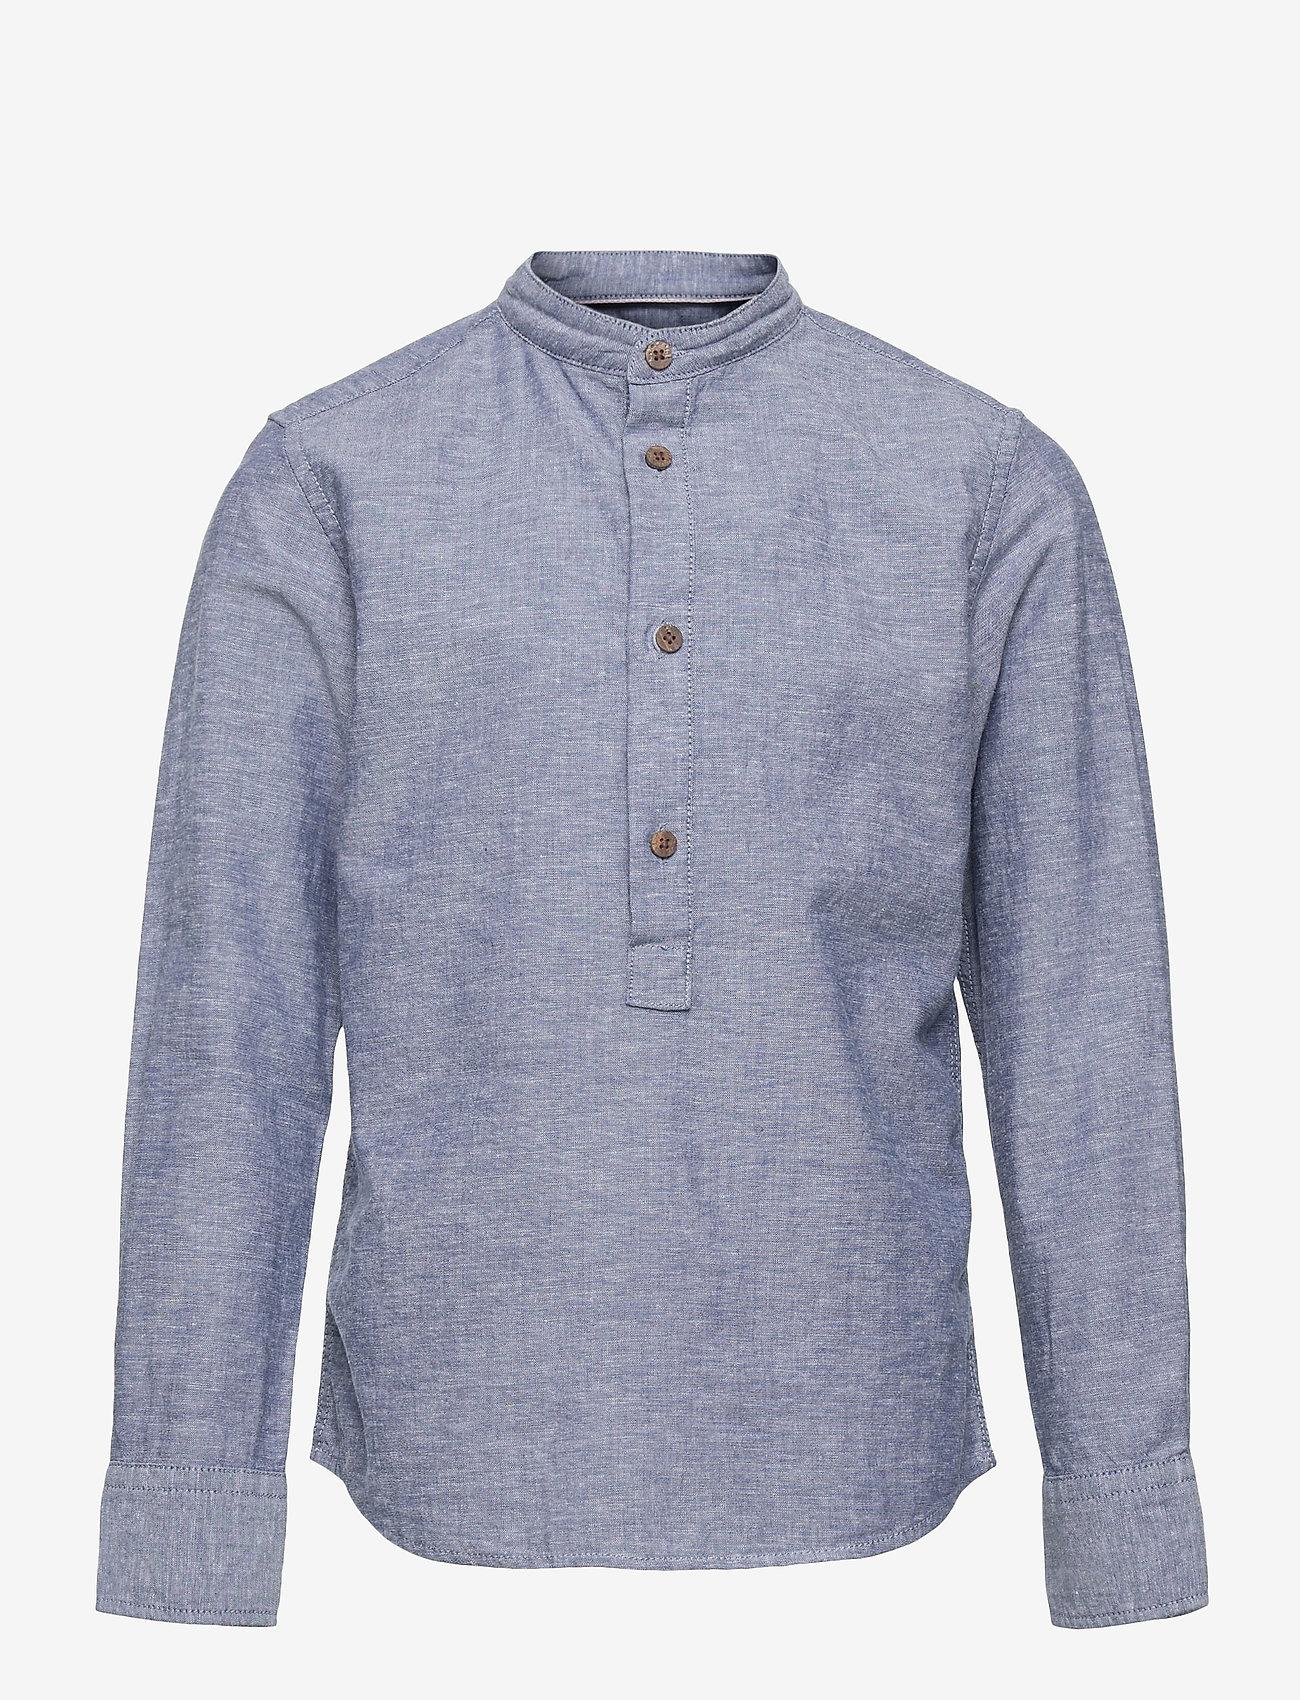 Jack & Jones - JPRBLASUMMER BAND TUNIC SHIRT L/S JR - shirts - faded denim - 0